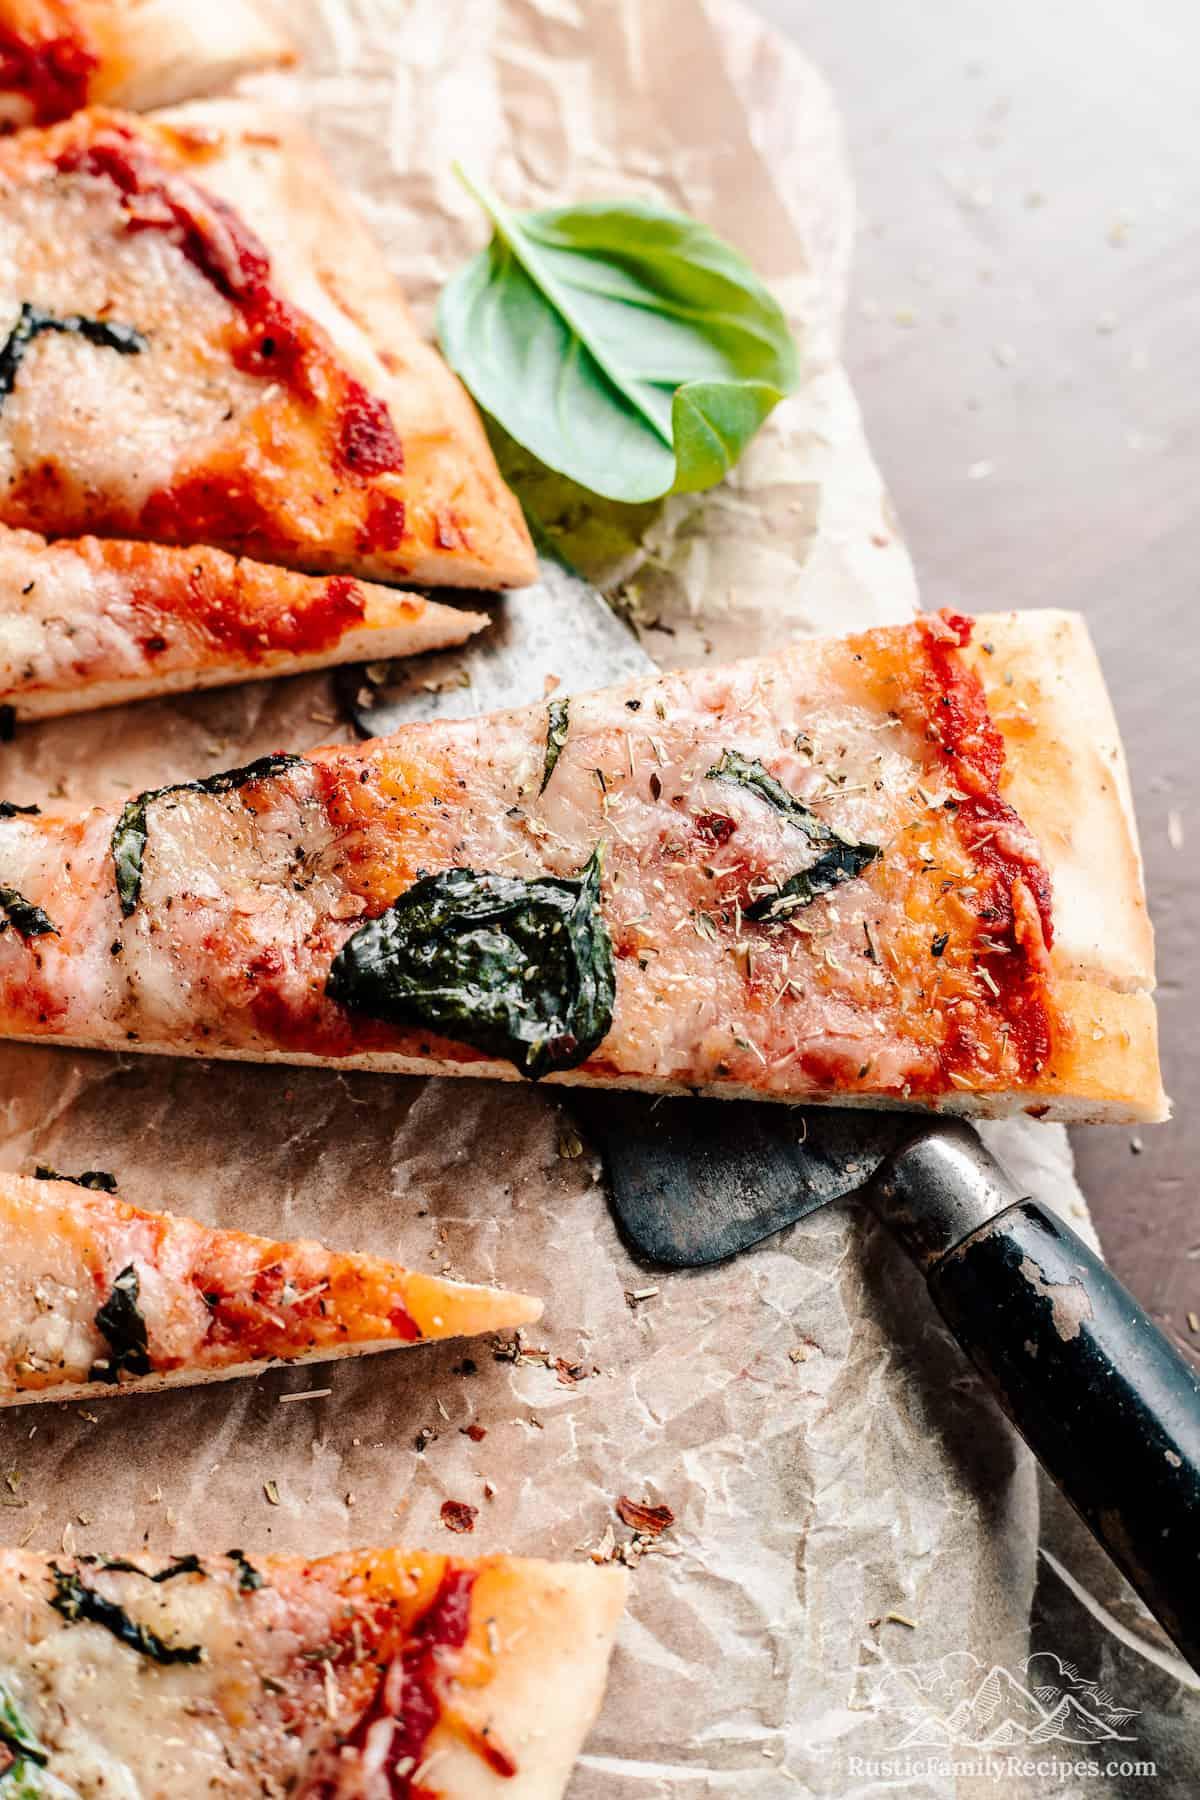 A slice of sourdough pizza